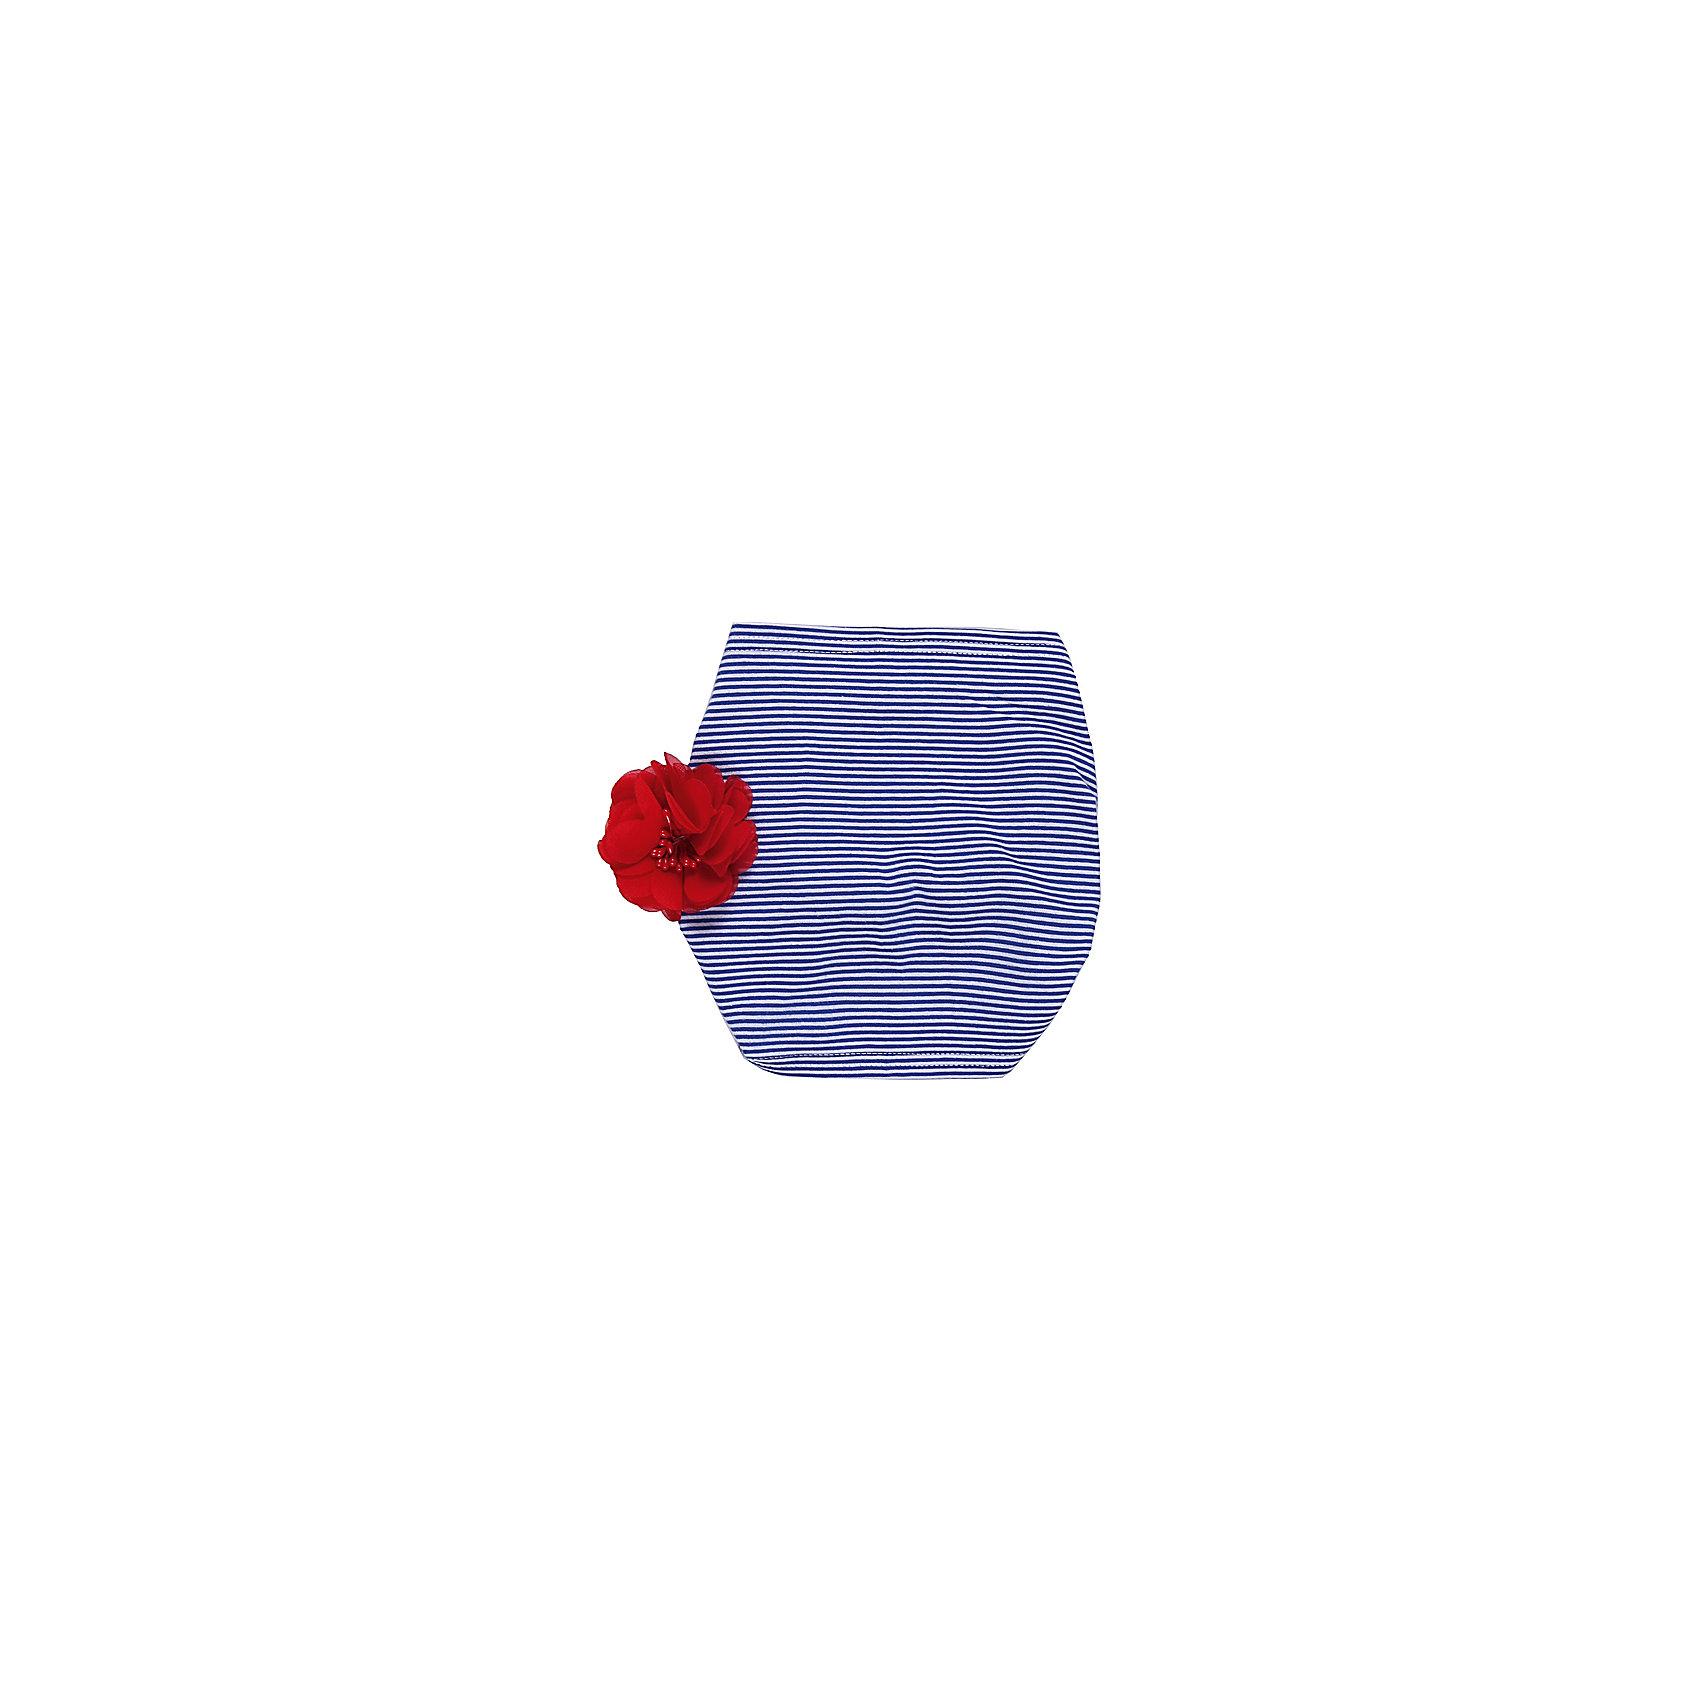 Повязка на голову для девочки Sweet BerryЛетние<br>Трикотажная повязка на голову. Регулируется резинкой. Декорирована цветком.<br>Состав:<br>95% хлопок, 5% эластан<br><br>Ширина мм: 89<br>Глубина мм: 117<br>Высота мм: 44<br>Вес г: 155<br>Цвет: синий/красный<br>Возраст от месяцев: 24<br>Возраст до месяцев: 36<br>Пол: Женский<br>Возраст: Детский<br>Размер: 50,52,54<br>SKU: 4521112